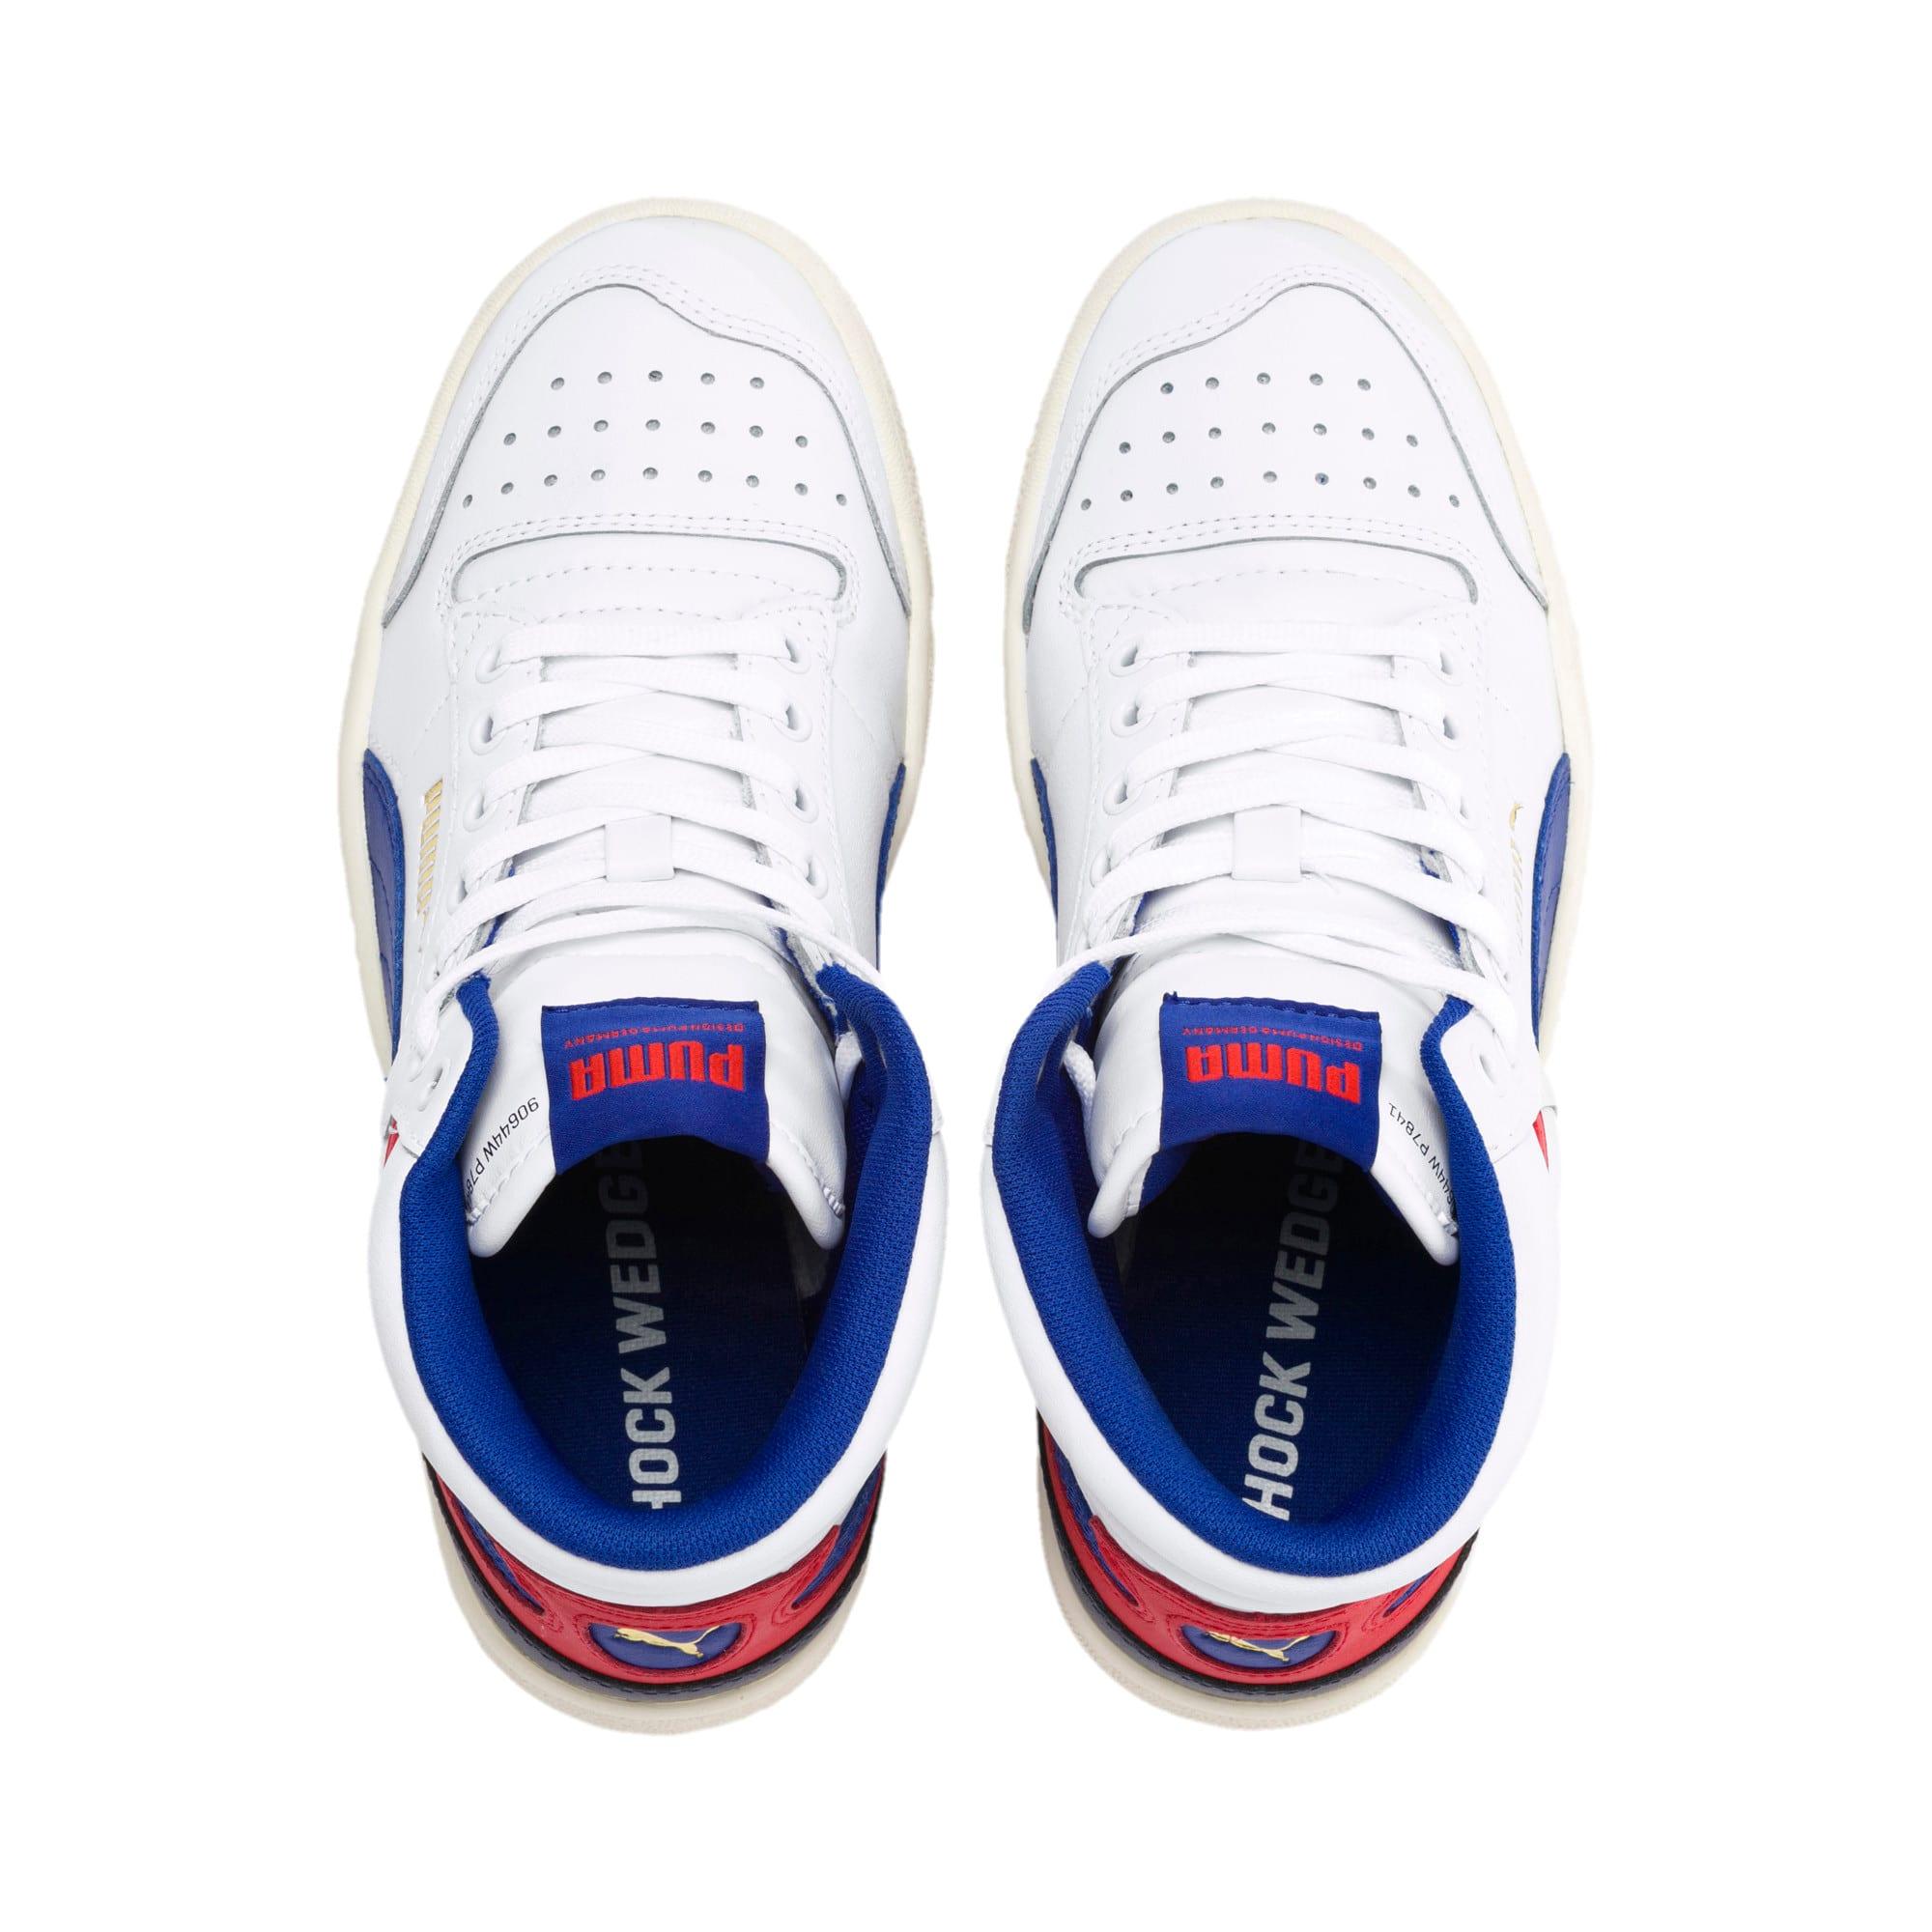 Thumbnail 6 of Ralph Sampson Mid Sneakers JR, White-SurfTheWeb-Marshmallow, medium